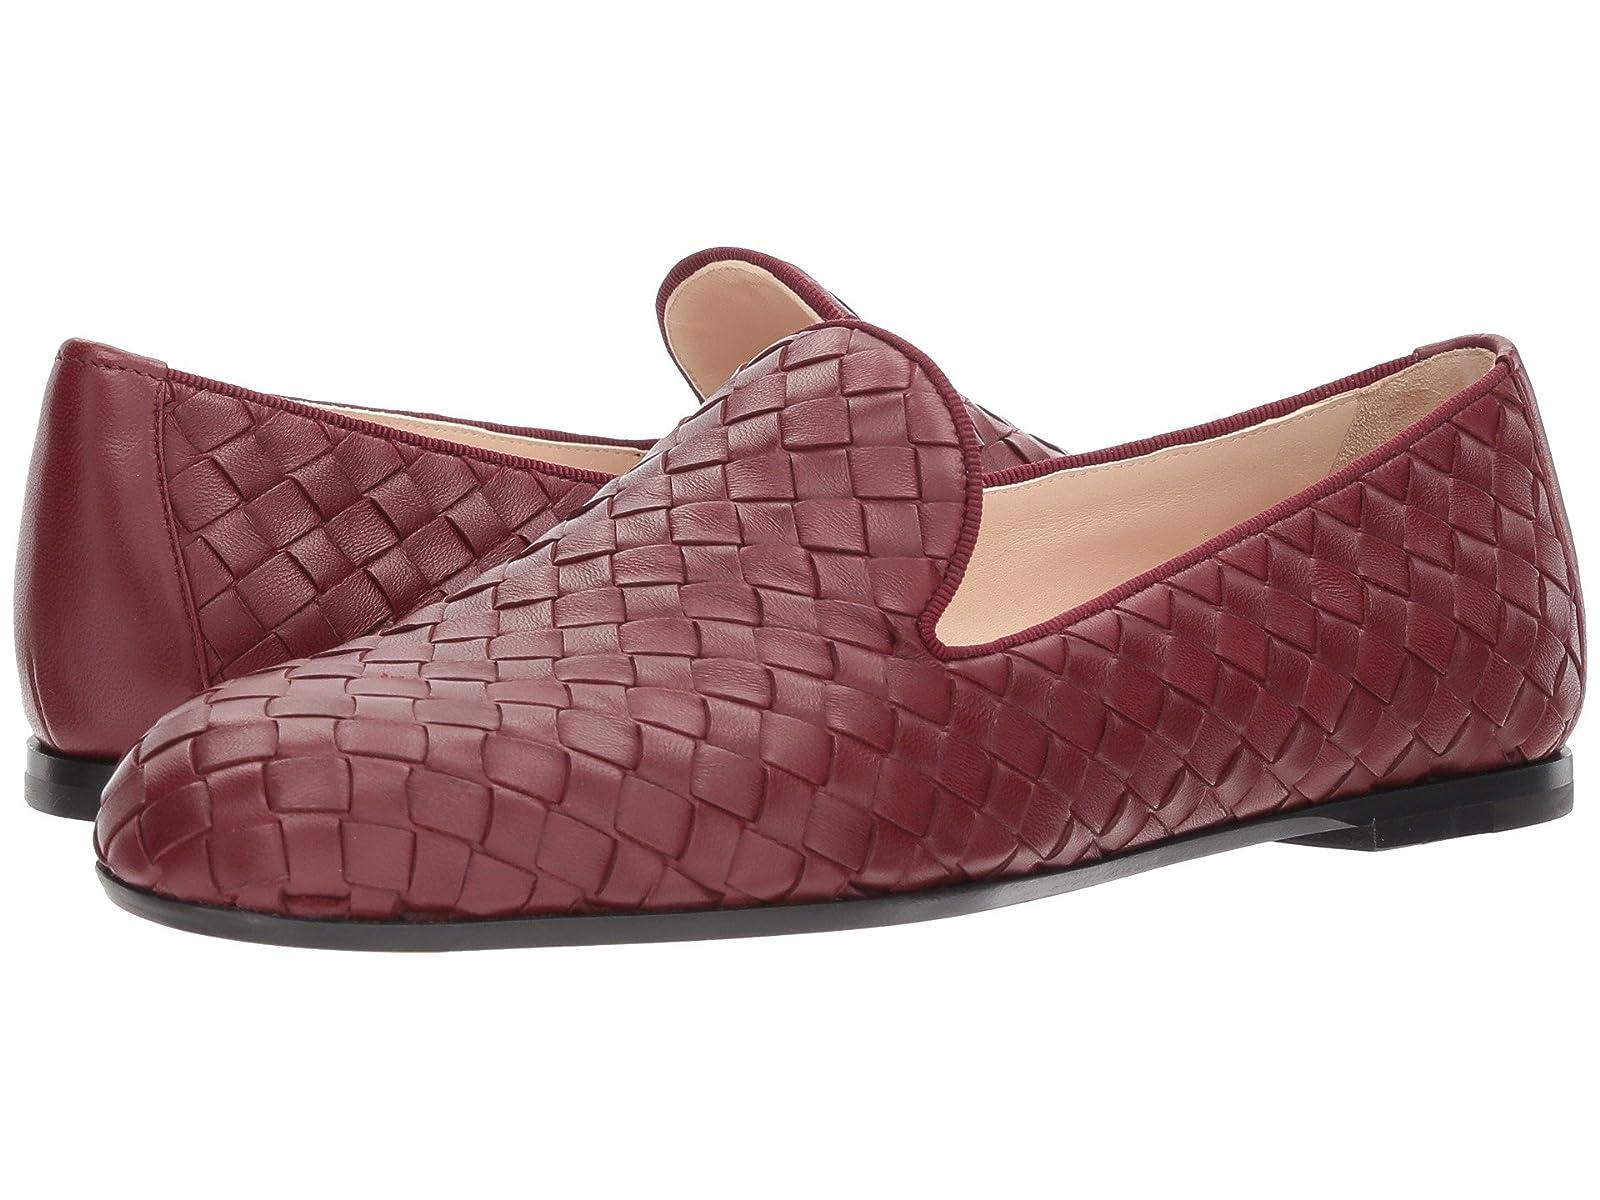 Bottega Veneta Intrecciato LoaferAtmospheric grades have affordable shoes